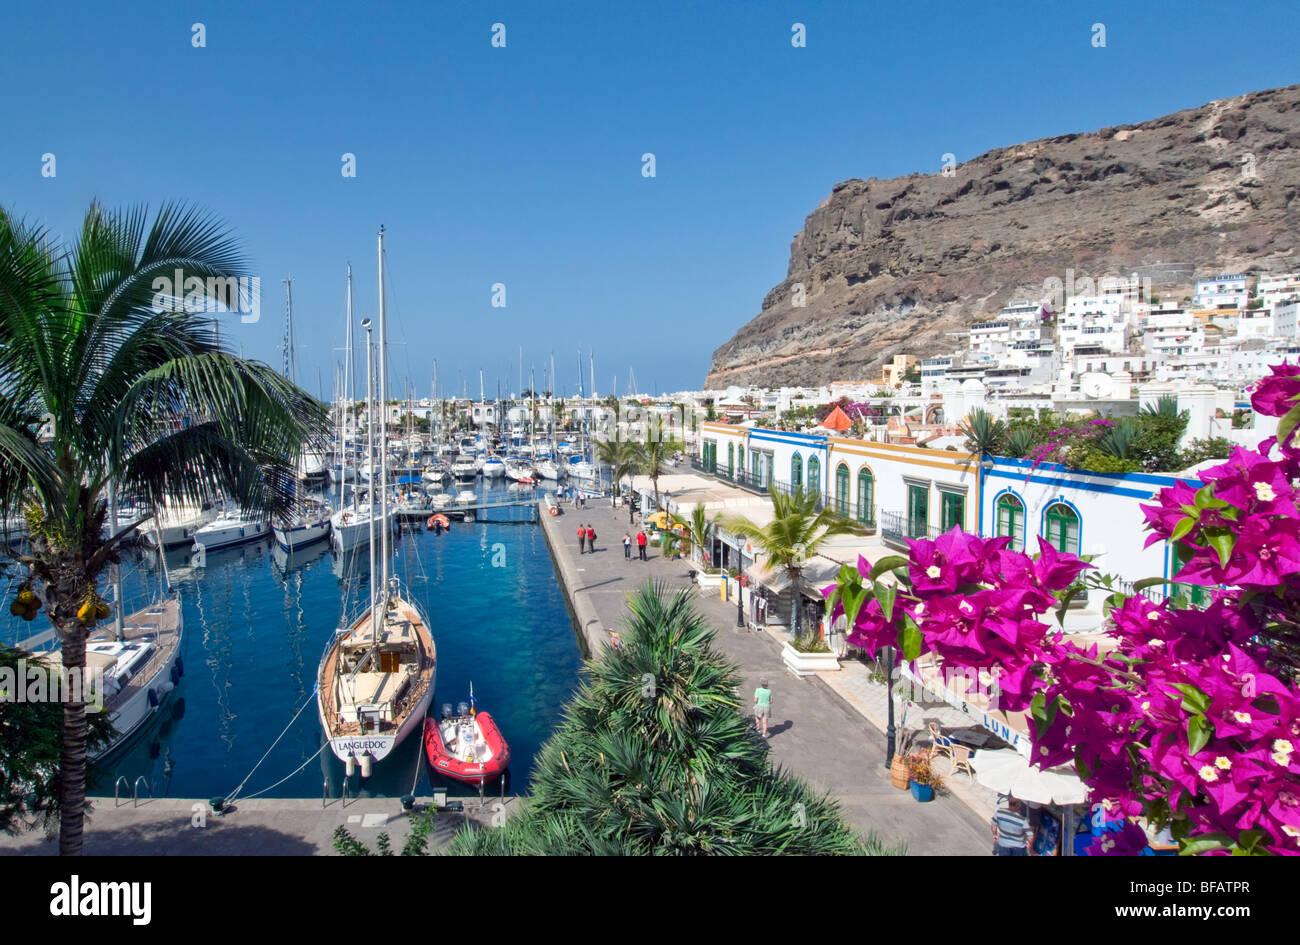 Puerto de Mogan Blick über Bougainvillea Blumen Yacht Marina Promenade und Restaurants Gran Canaria Kanaren Stockbild